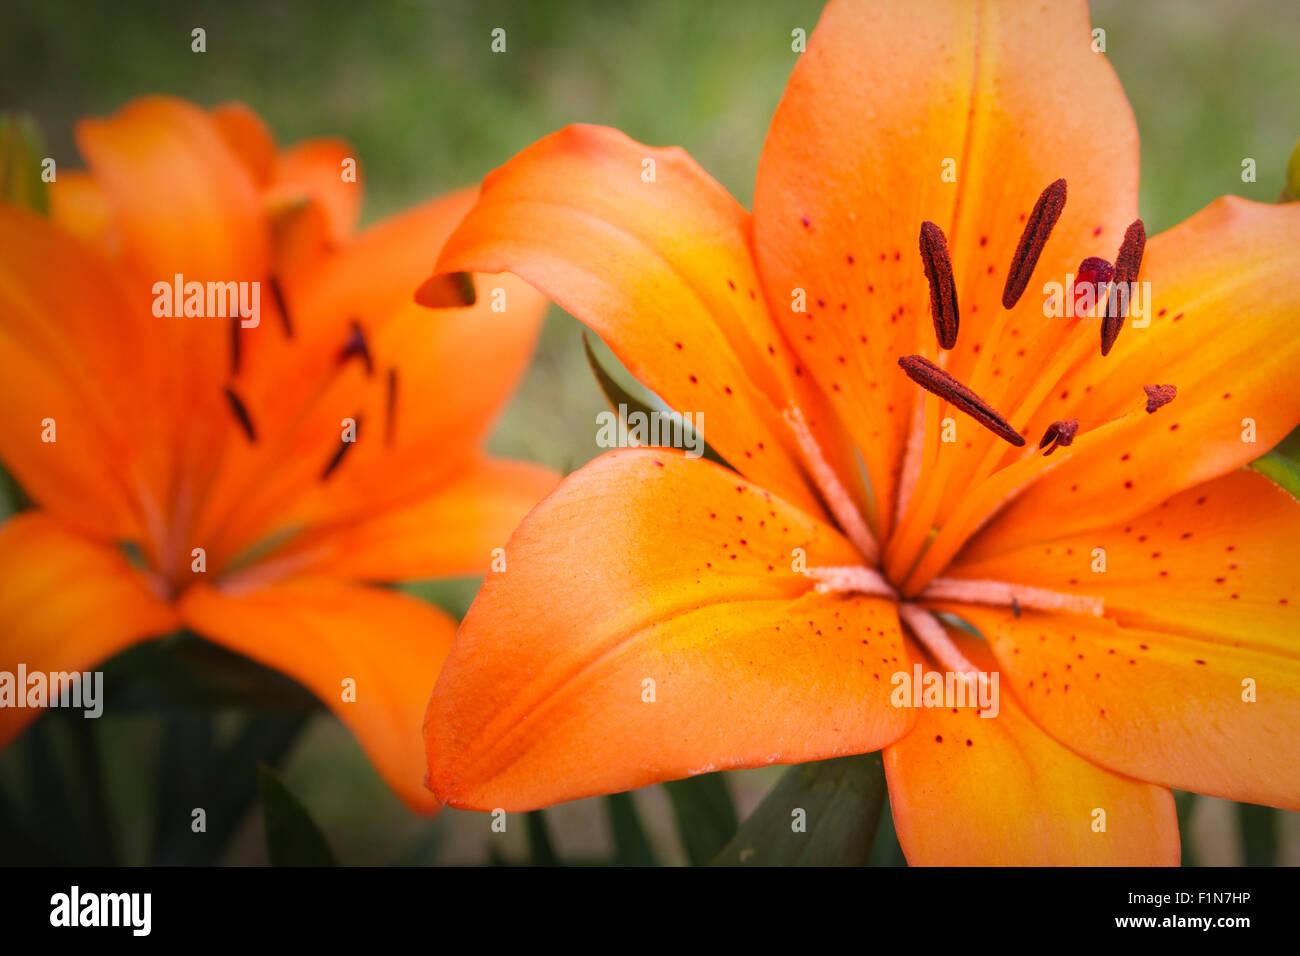 Tiger Lily, Lilium bulbiferum with narrow focal plane, focus on stamen. Stock Photo